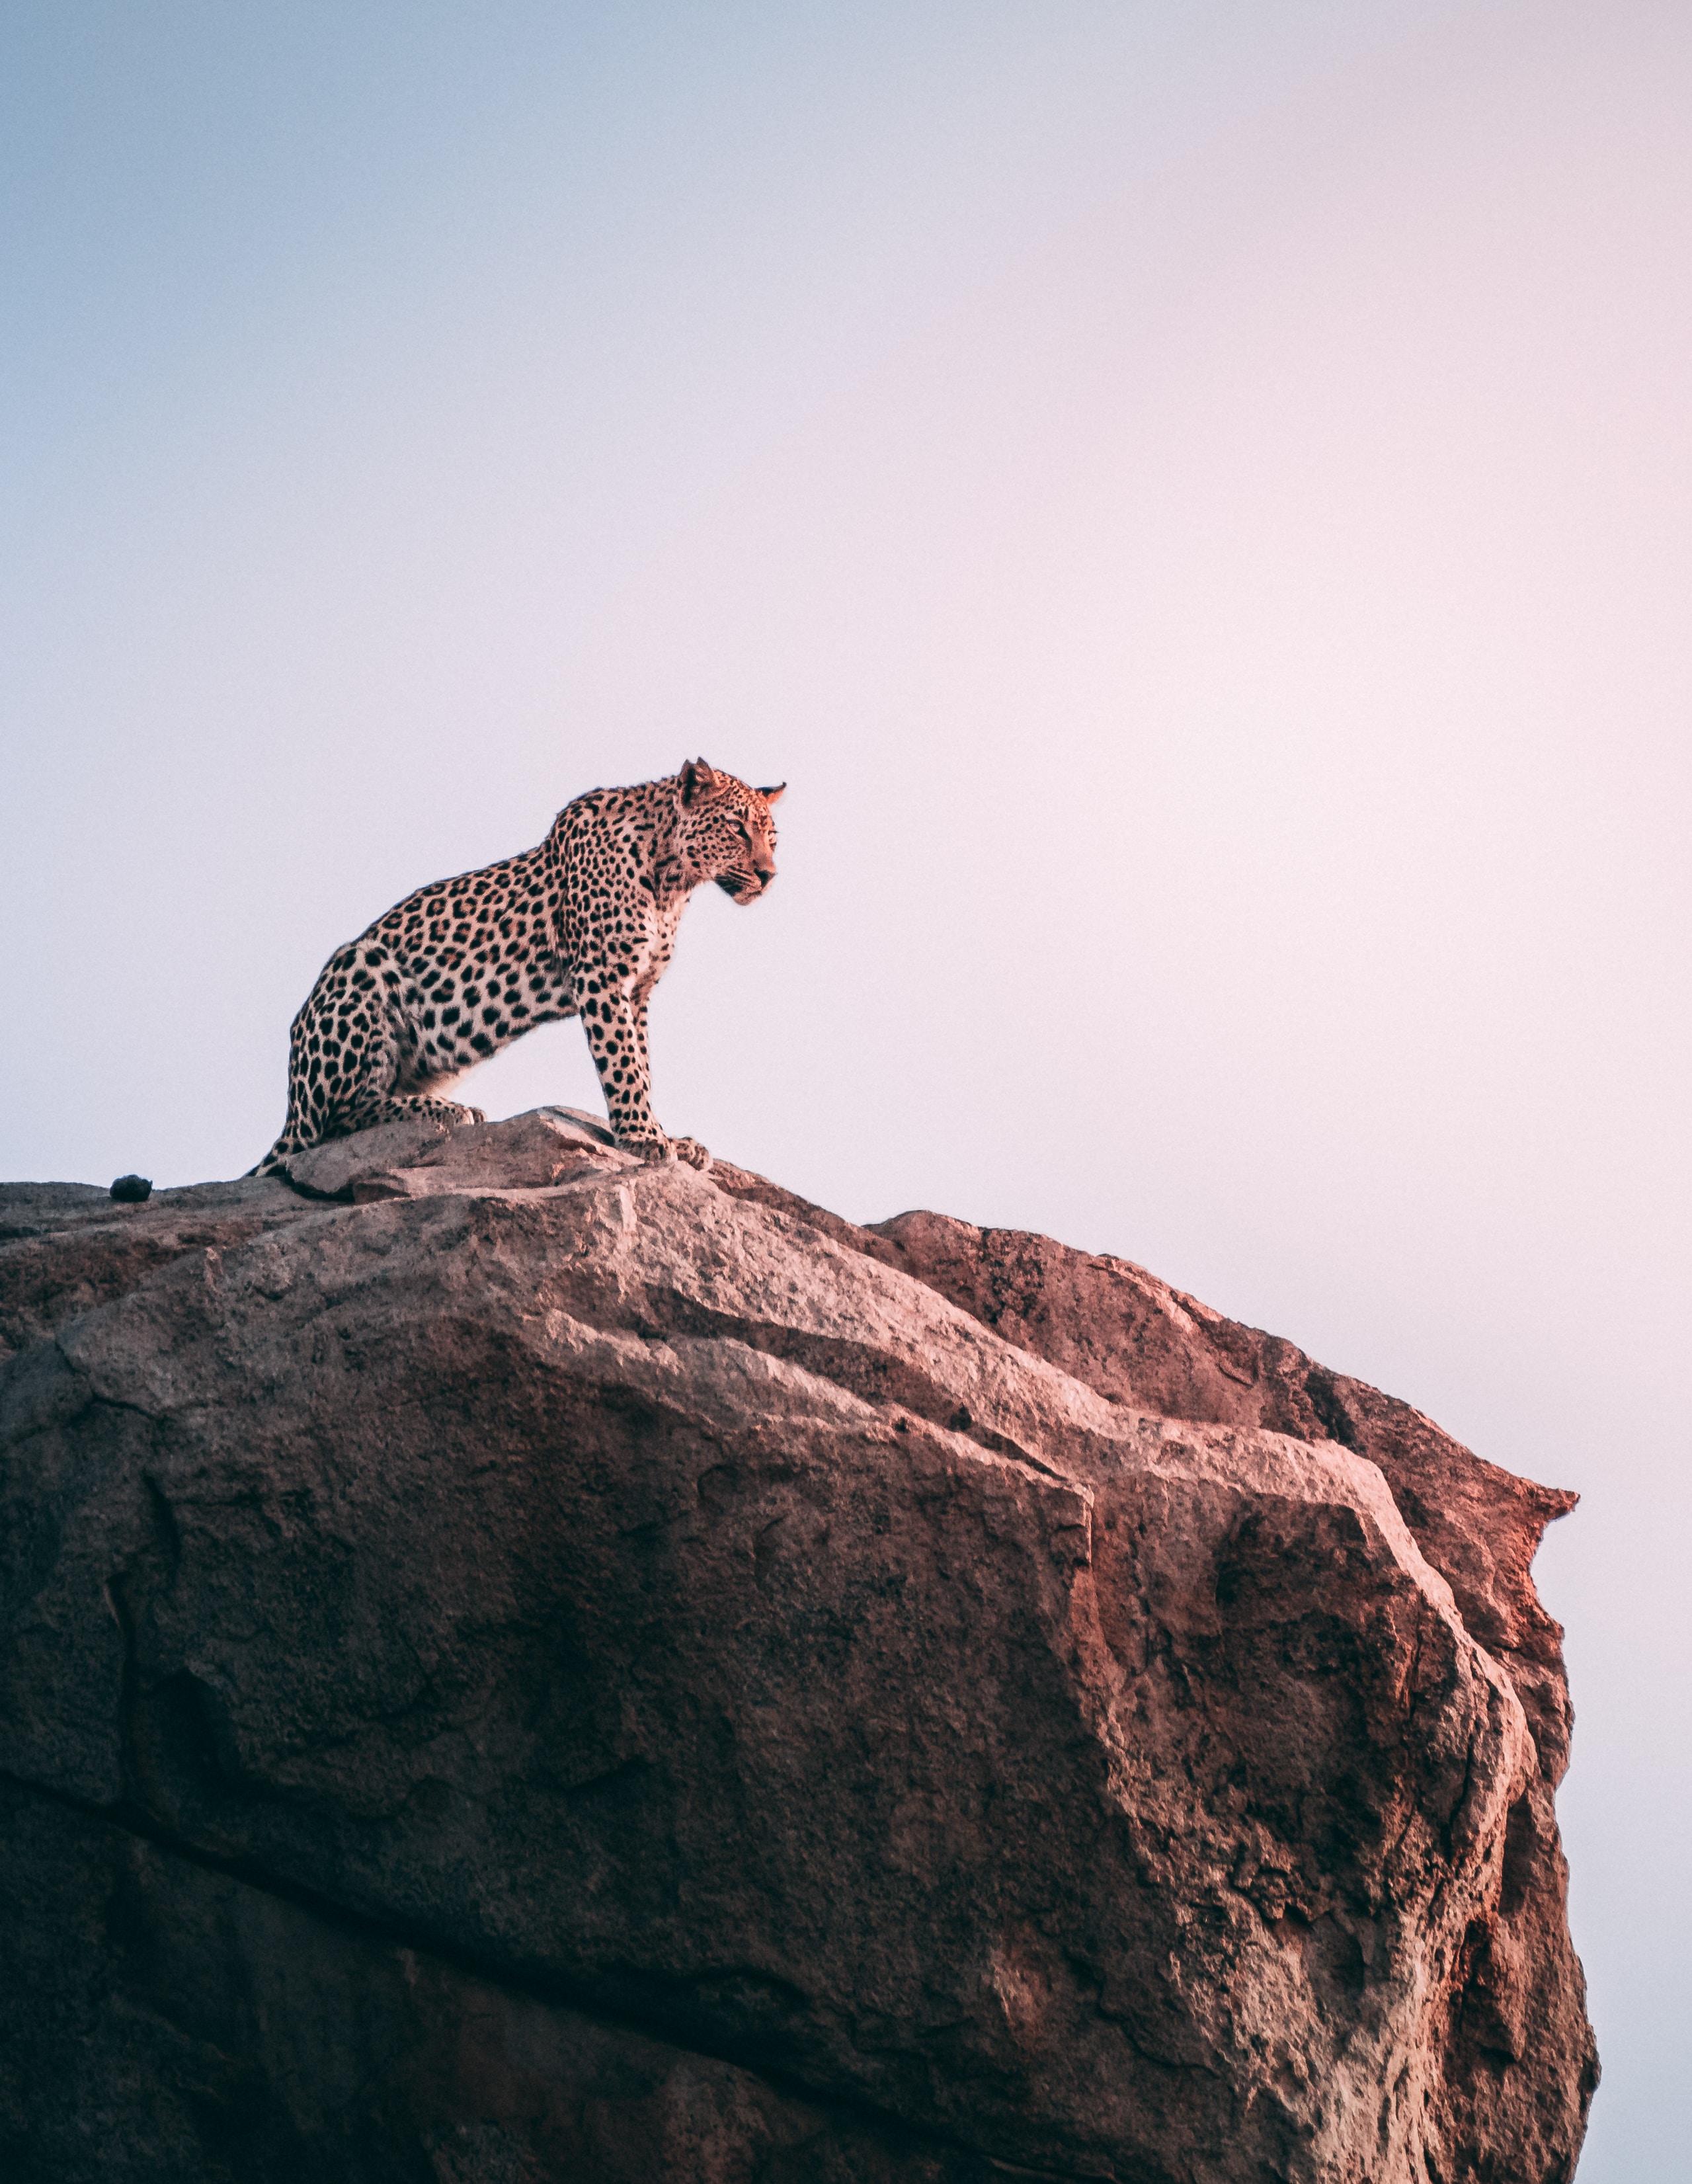 brown leopard on top of grey rock